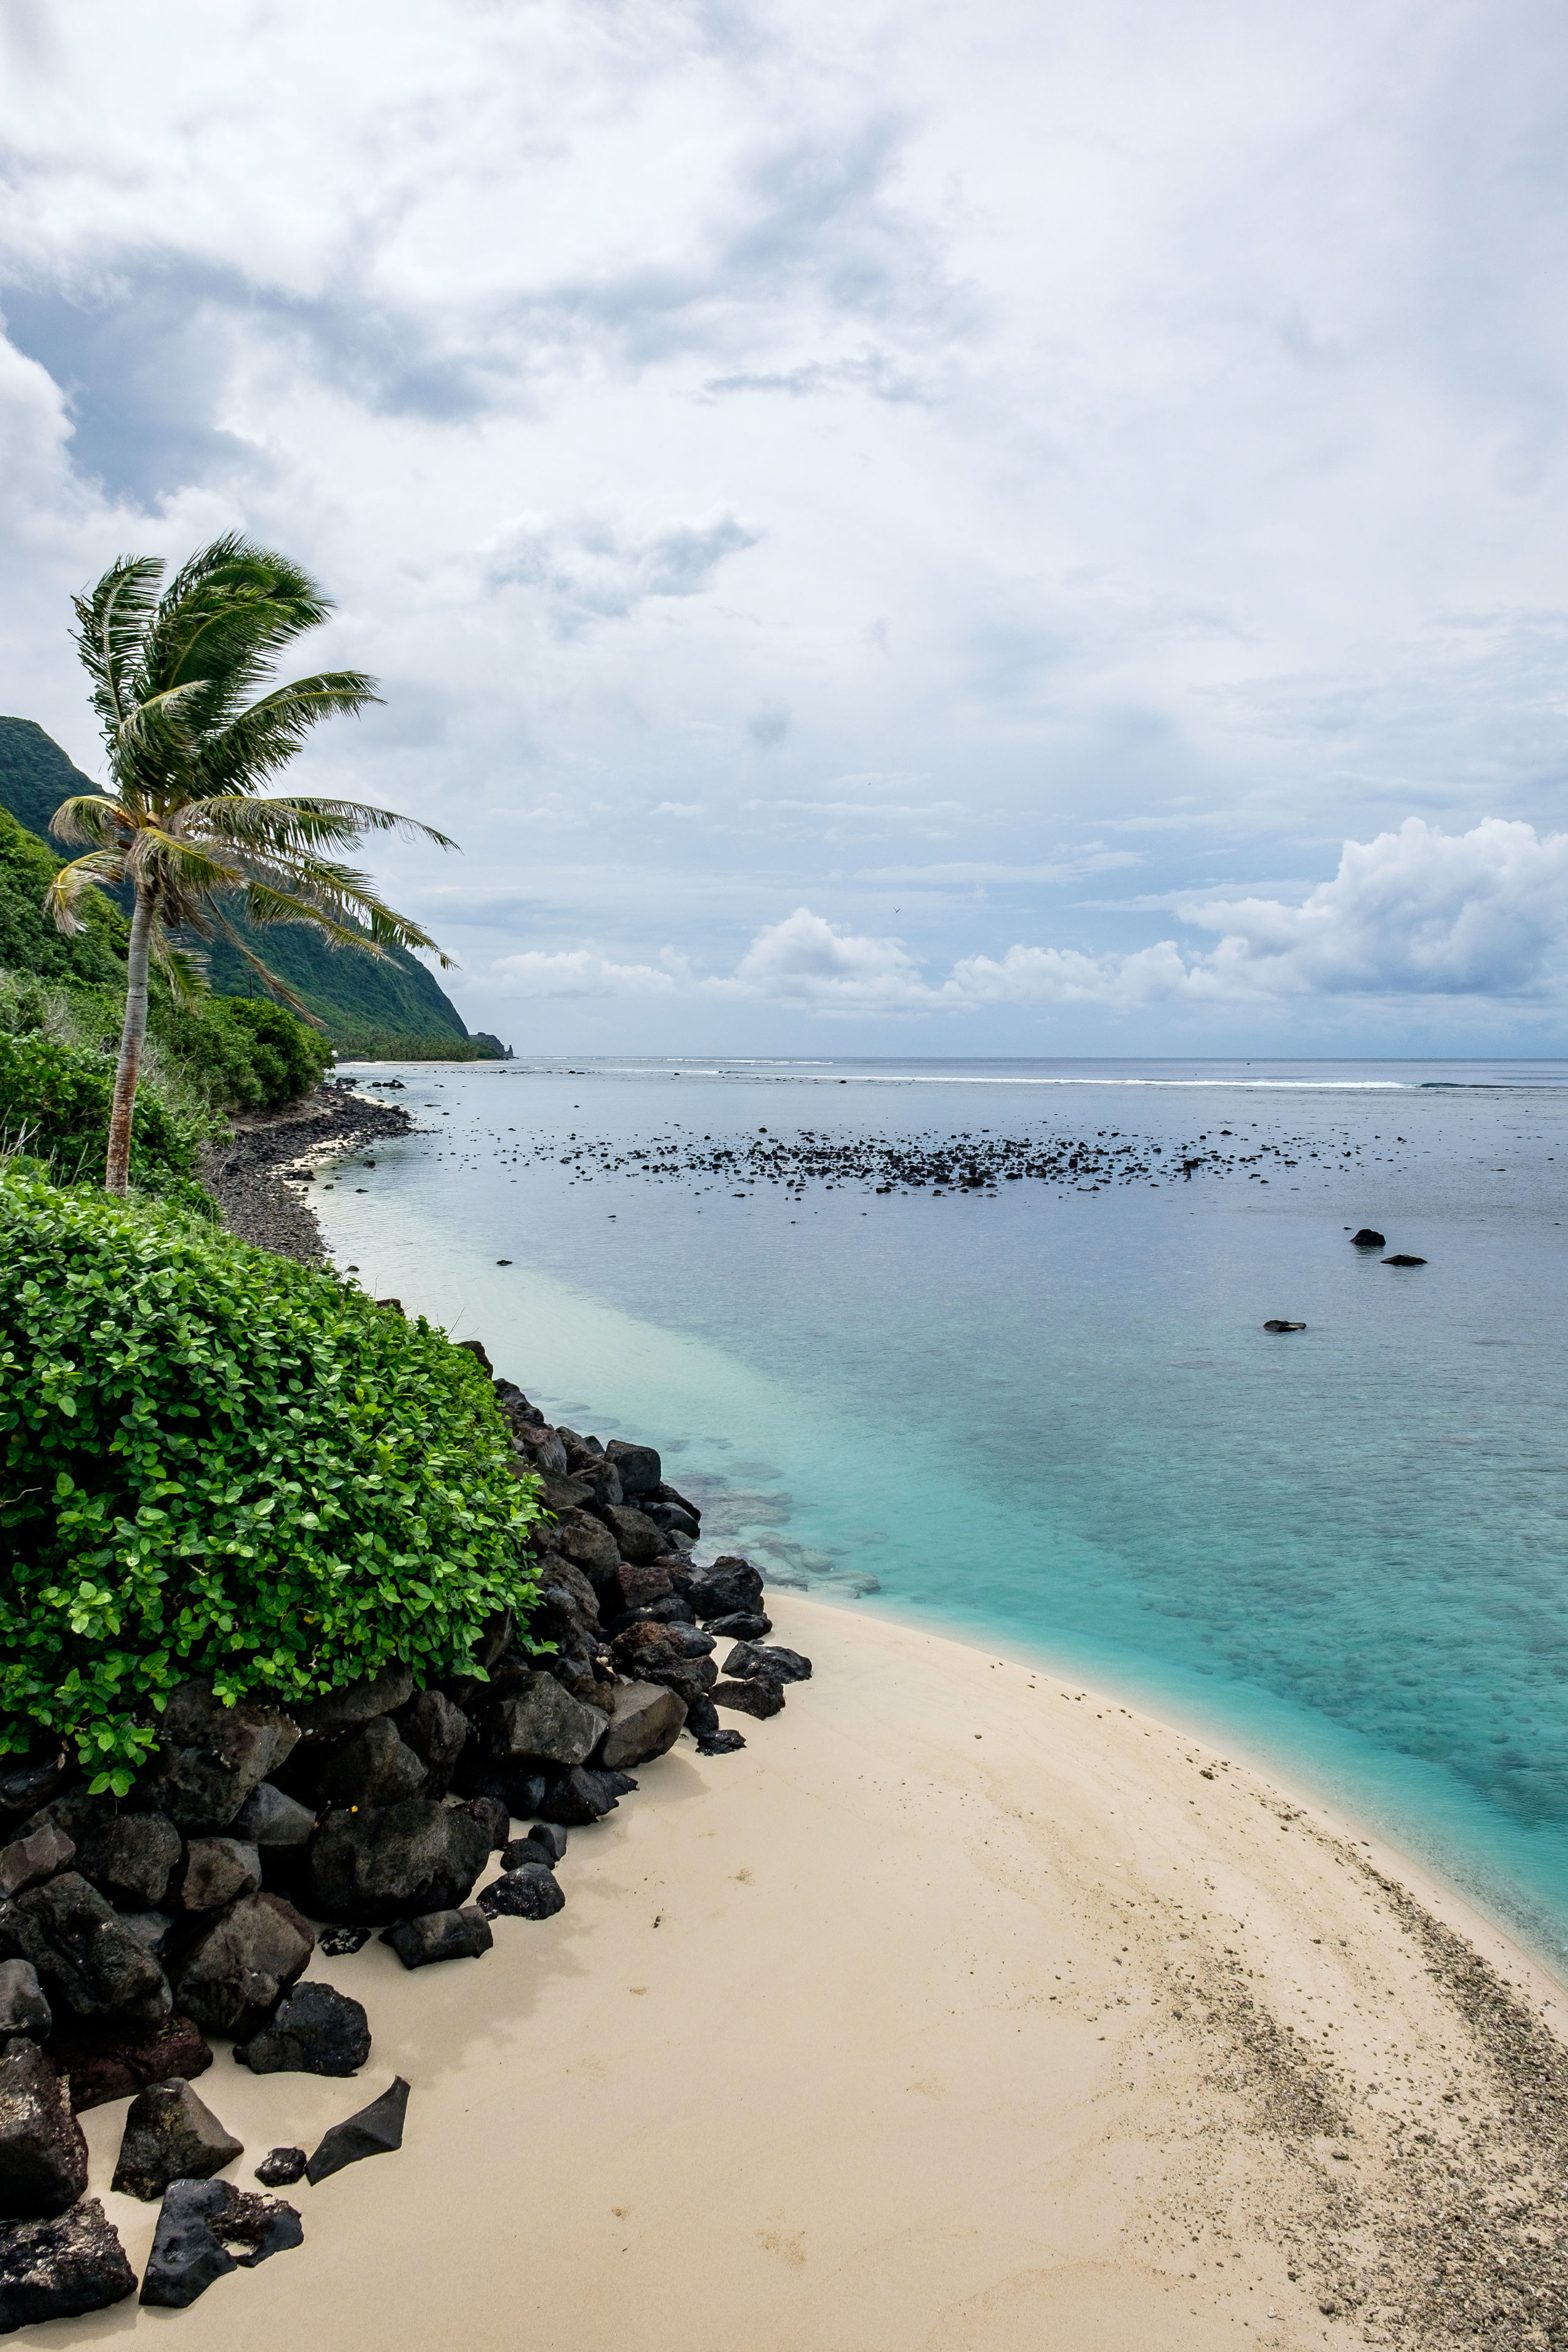 20161213-JI-American Samoa National Park-_DSF0066.jpg